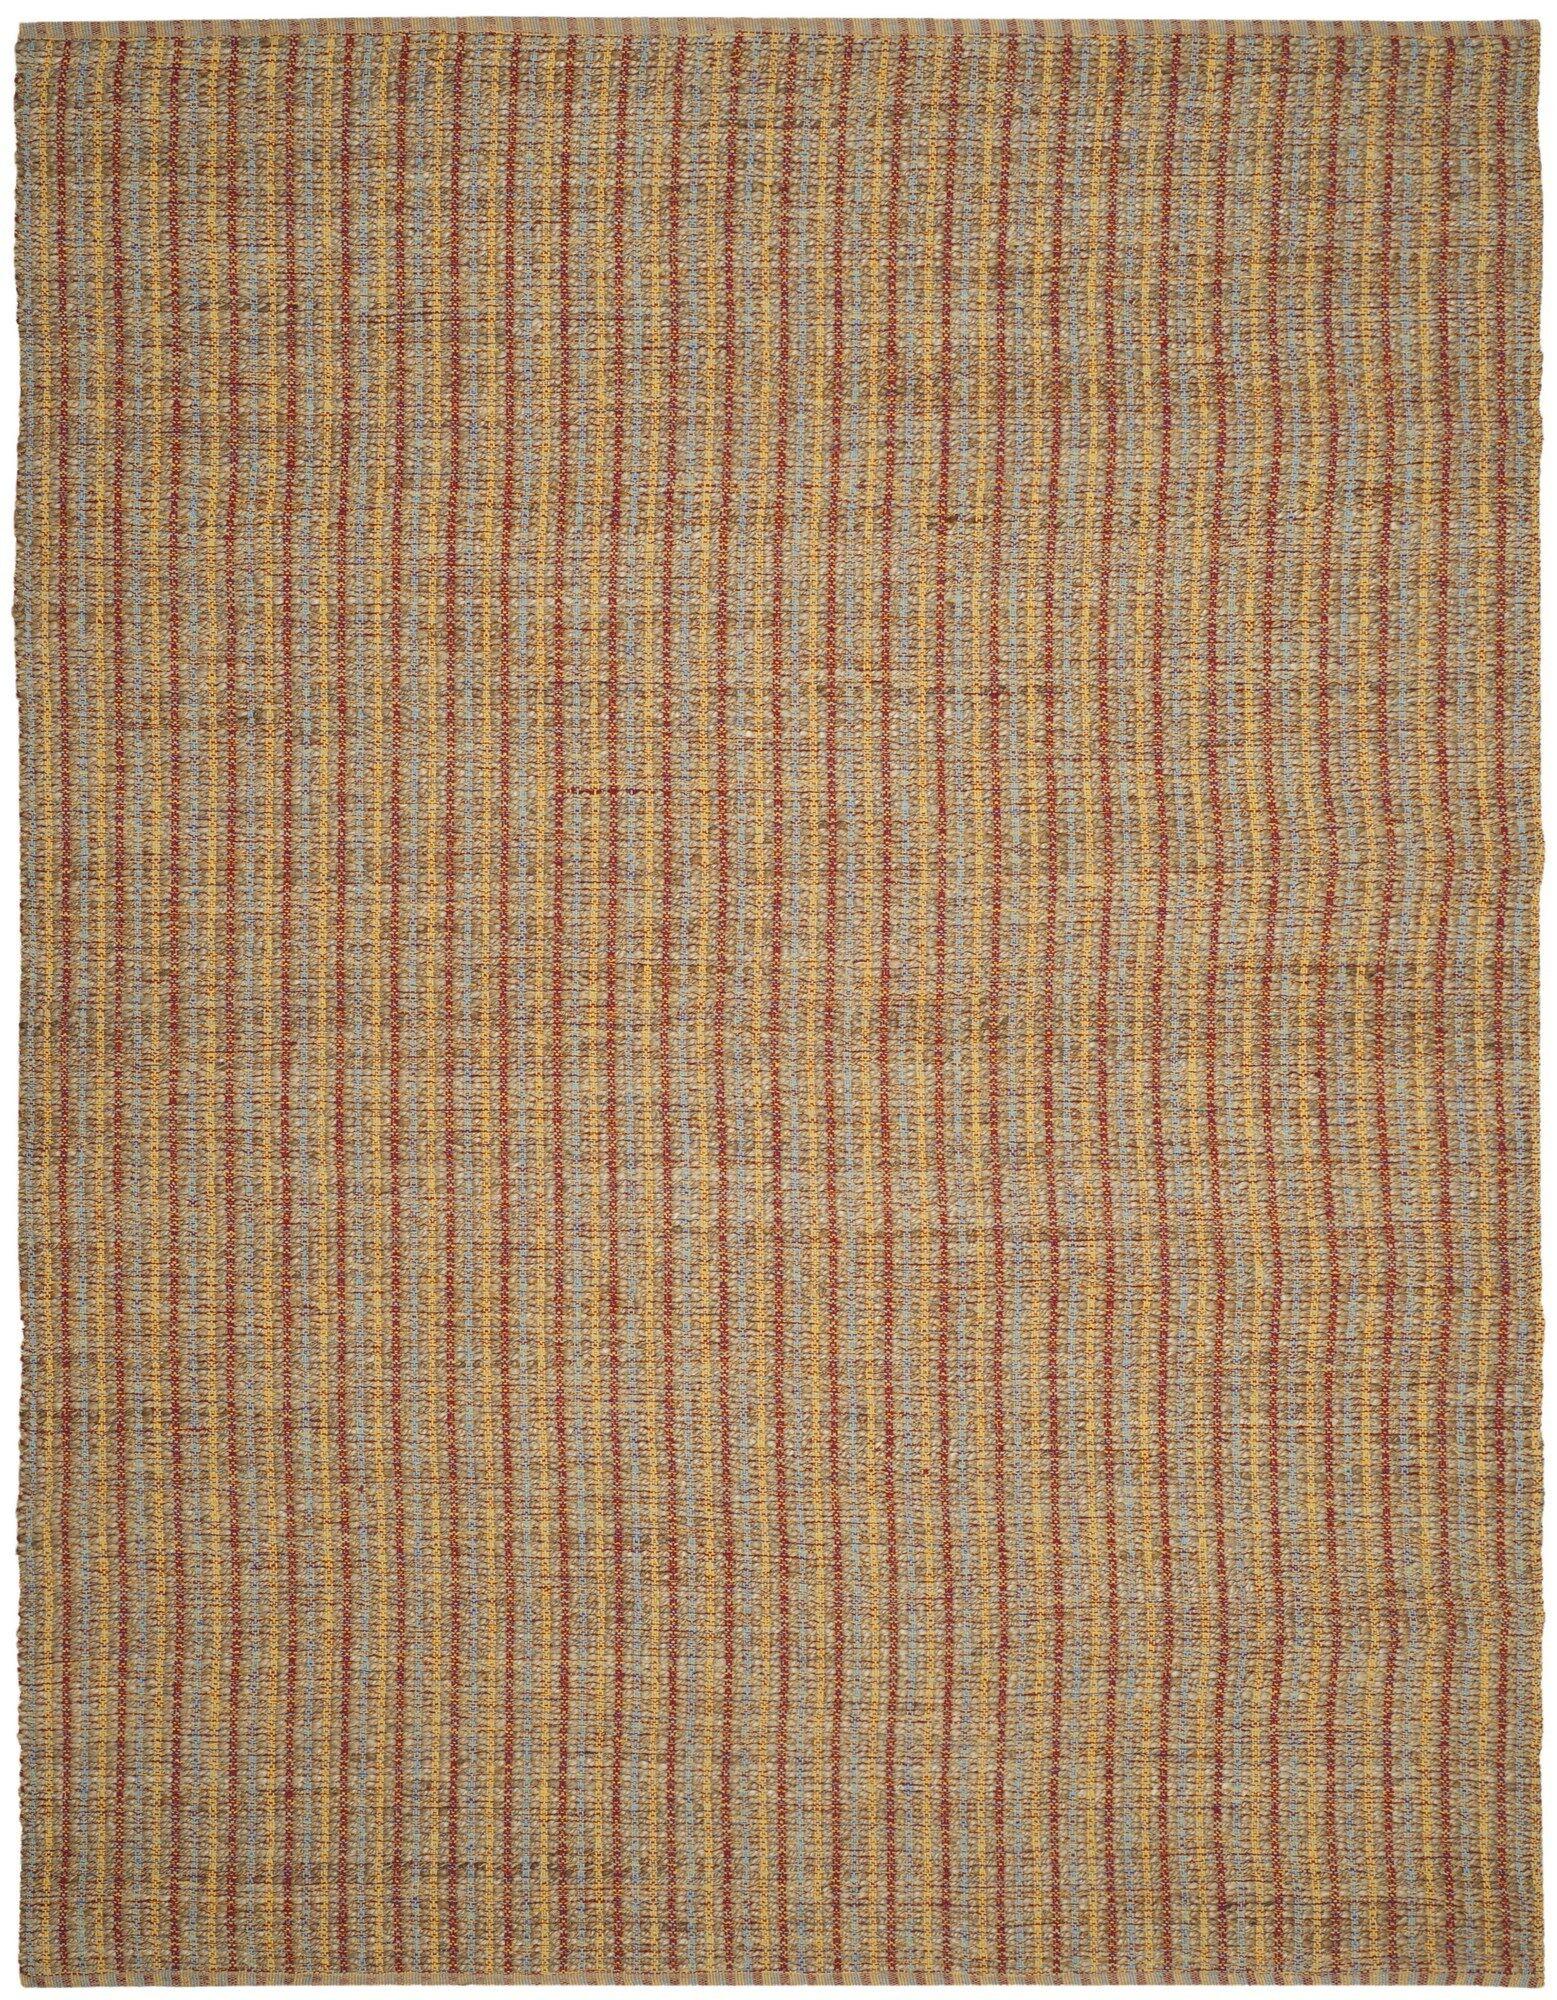 Bowen Hand-Woven Orange/Brown Area Rug Rug Size: Rectangle 8' x 10'